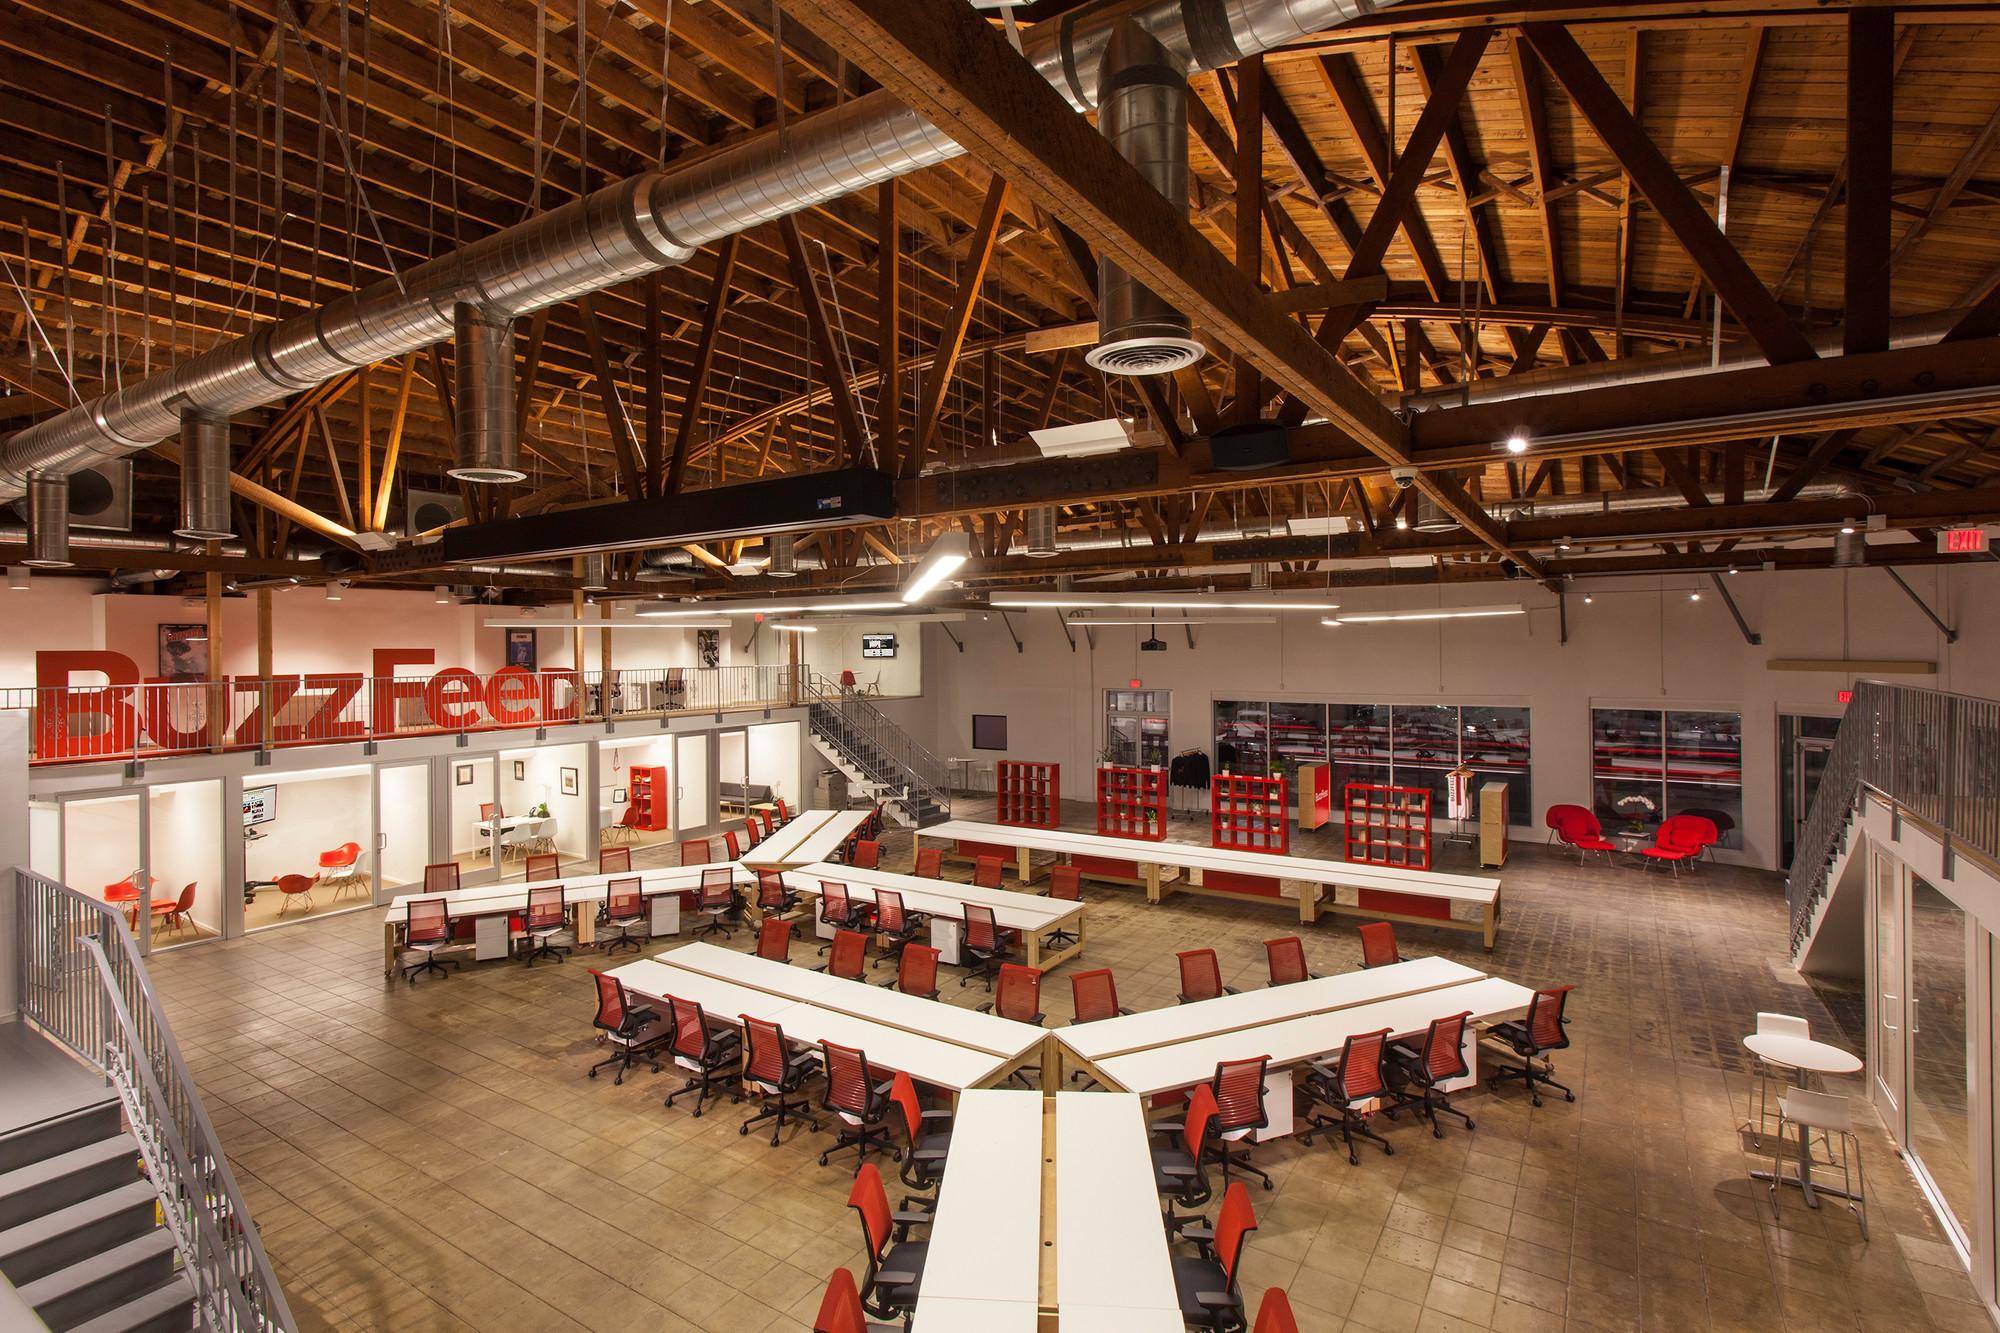 Buzzfeed LA Office / JIDK, © Peter Kubilus